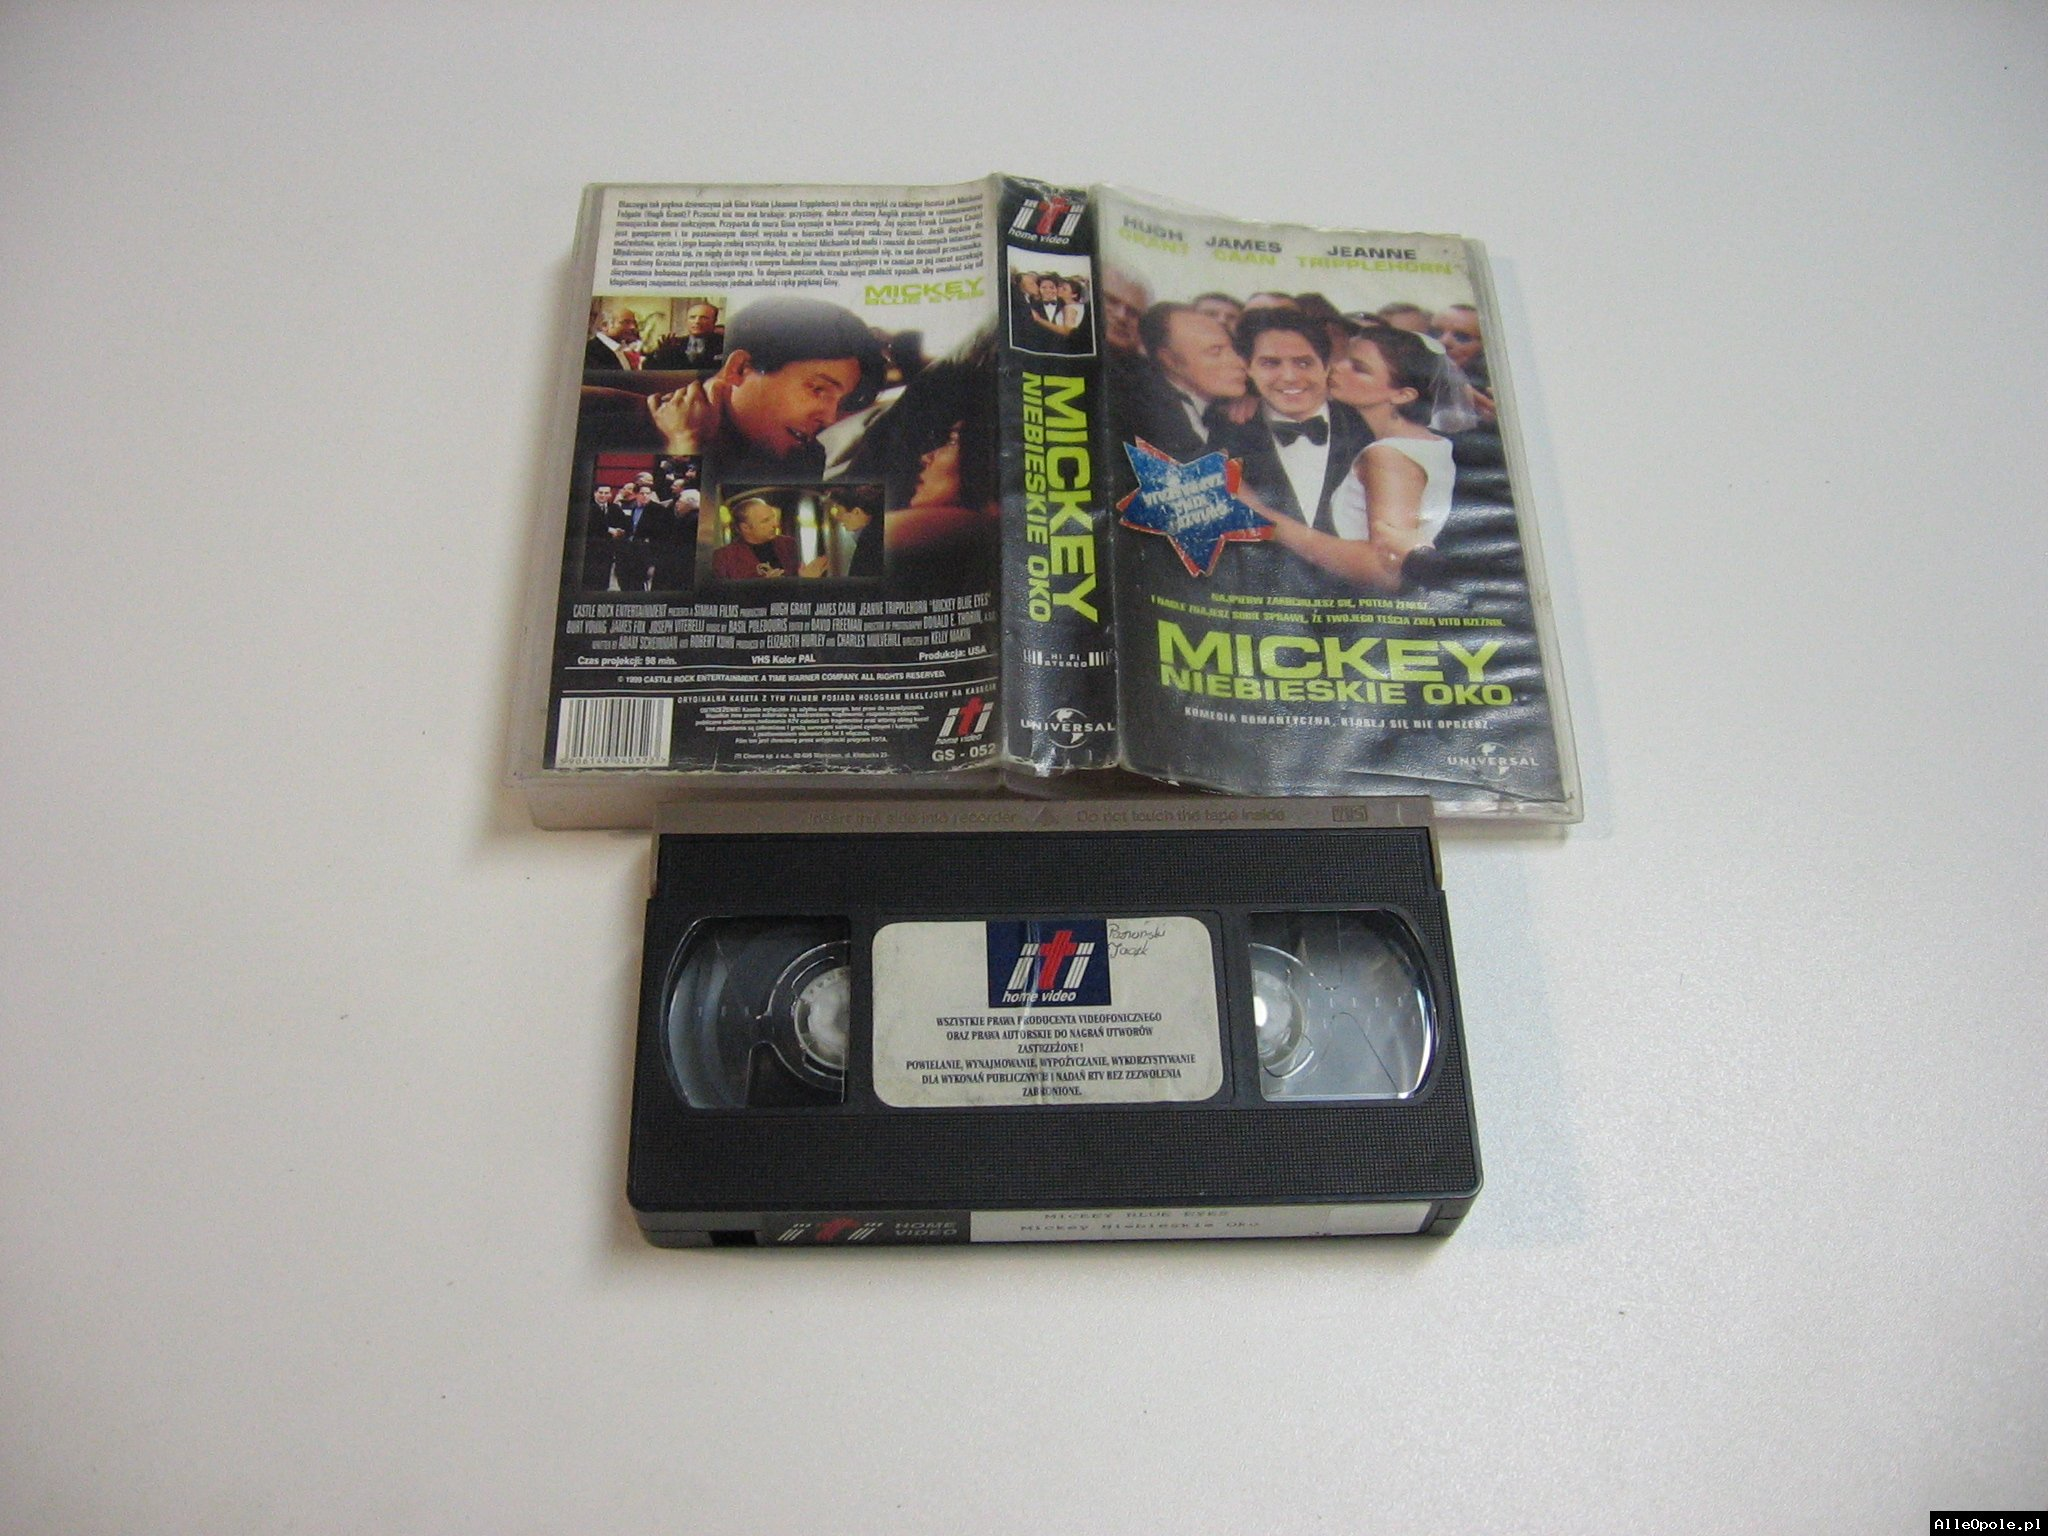 MICKEY NIEBIESKIE OKO - VHS Kaseta Video - Opole 1843